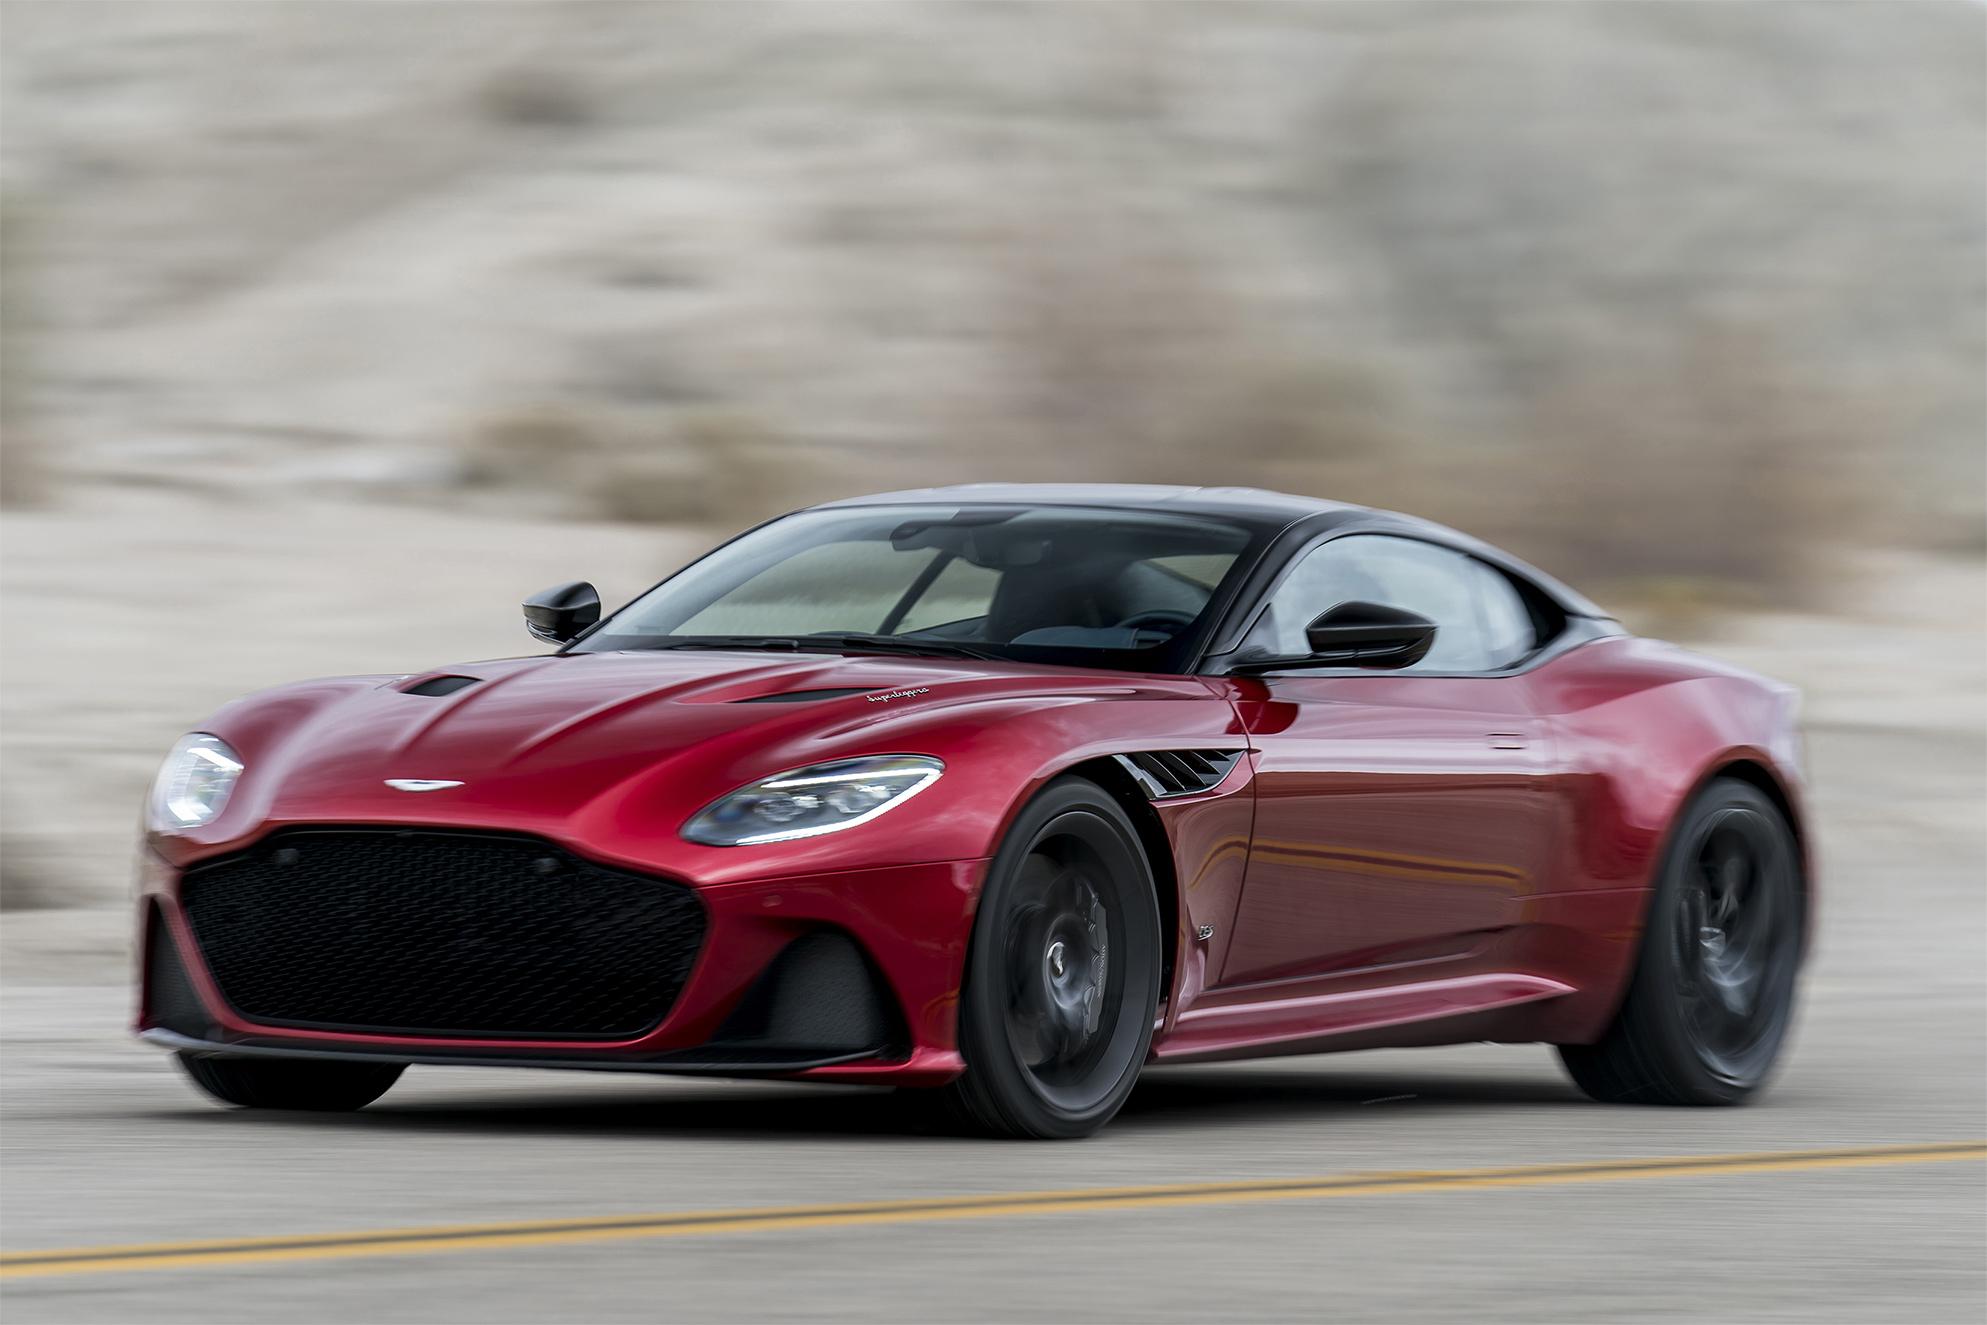 TrackWorthy - Aston Martin DBS Superleggera (8)